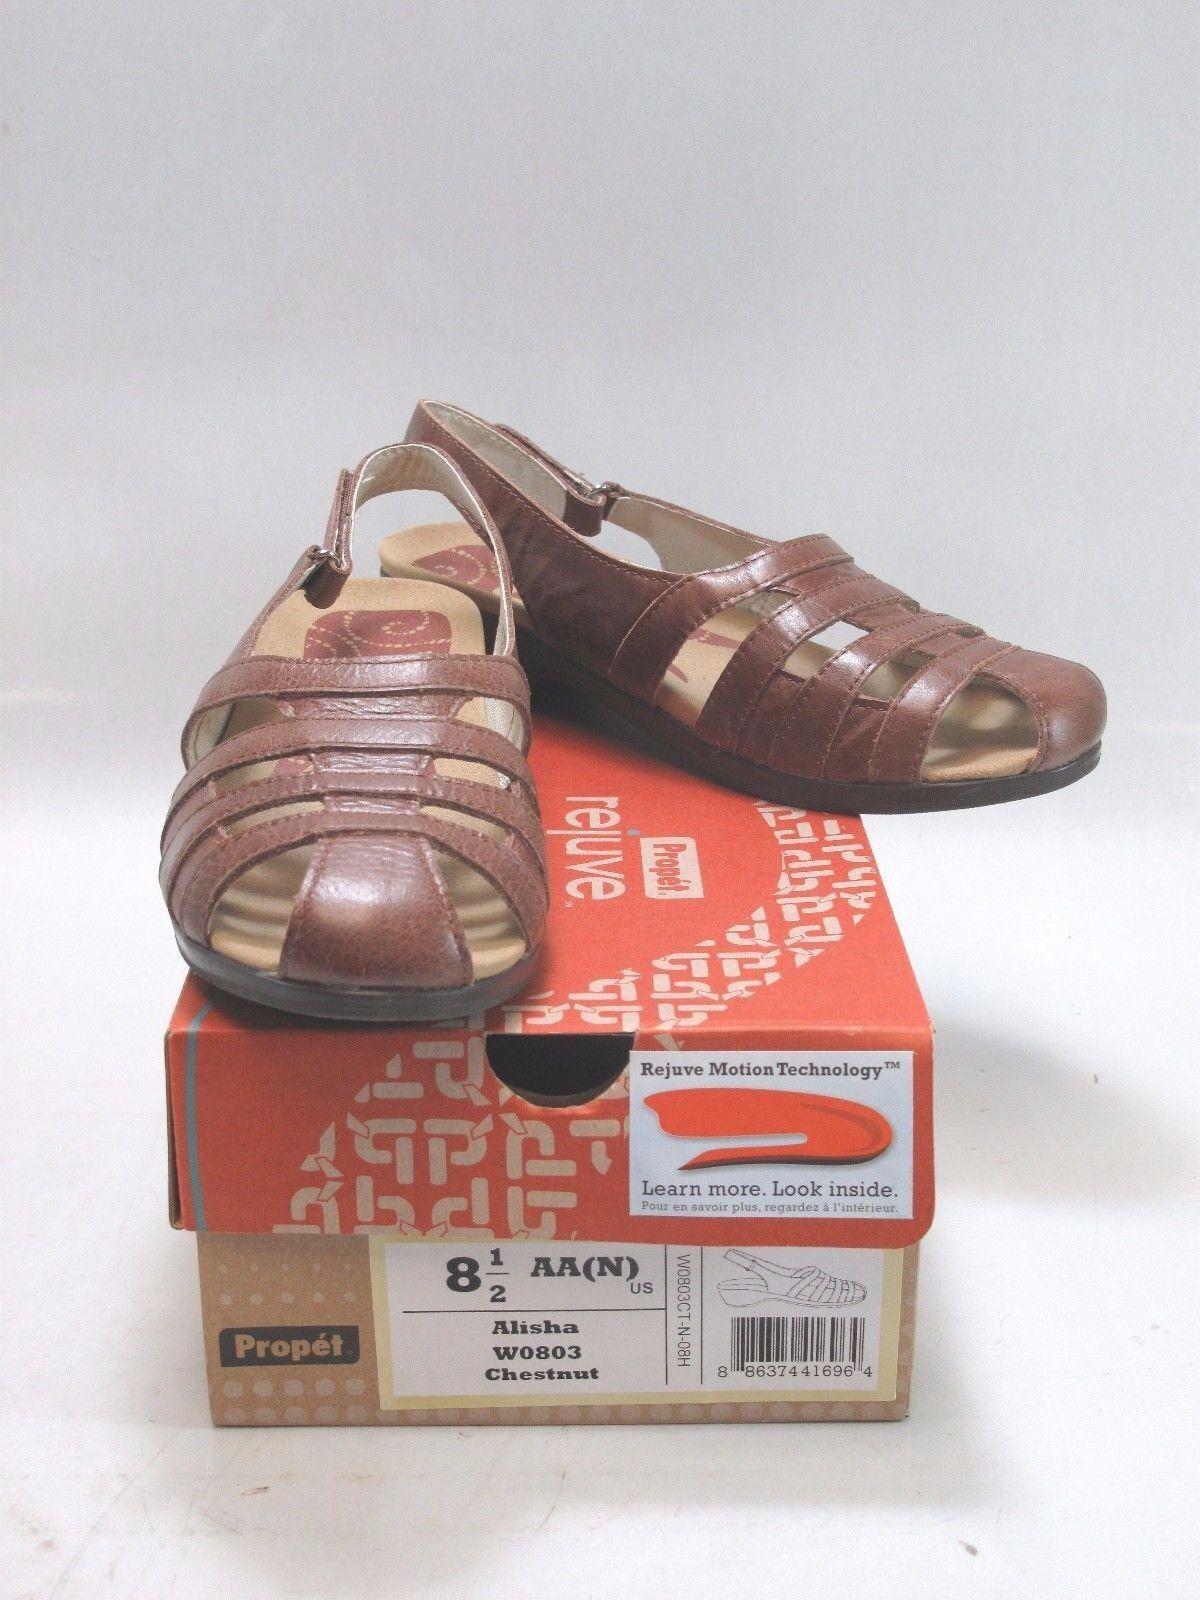 PROPET Damenschuhe ALISHA Braun Woven Leder Slingback Pump Sandale Sz 8.5